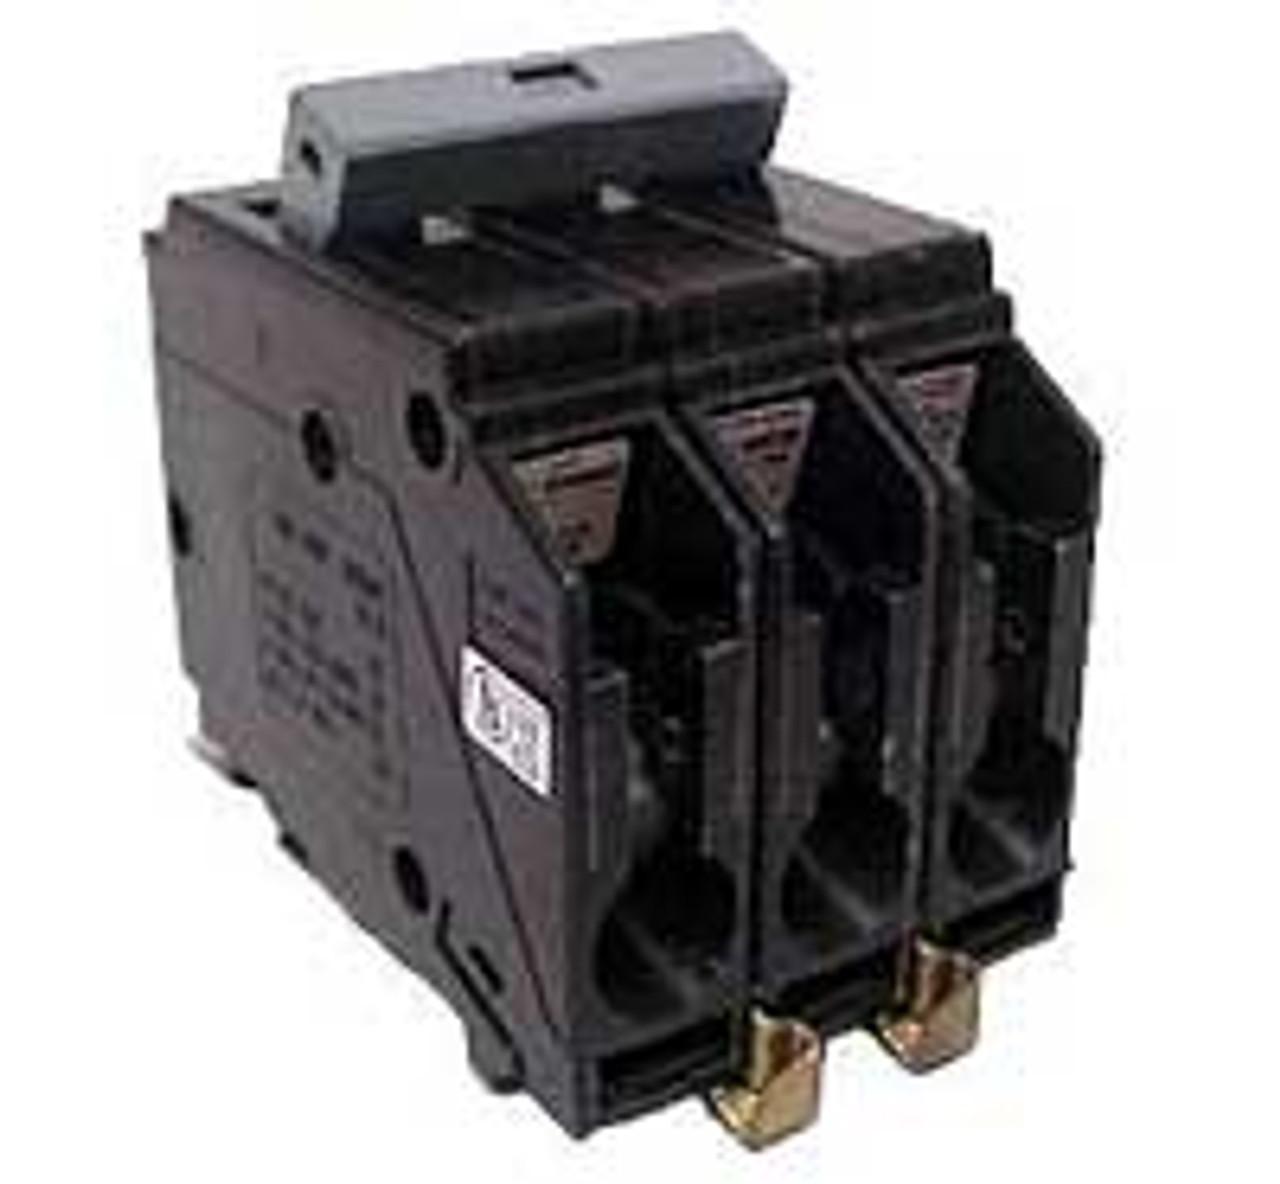 Cutler Hammer CHB330 3 Pole 30 Amp 240VAC Circuit Breaker - Used